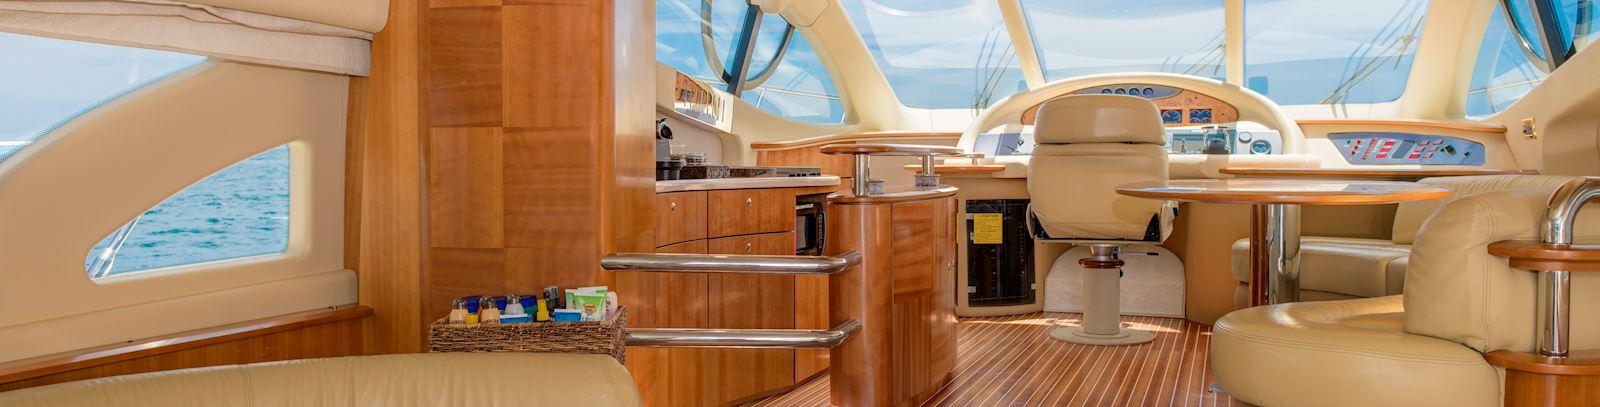 Atardecer a bordo - Grand Velas Riviera Nayarit